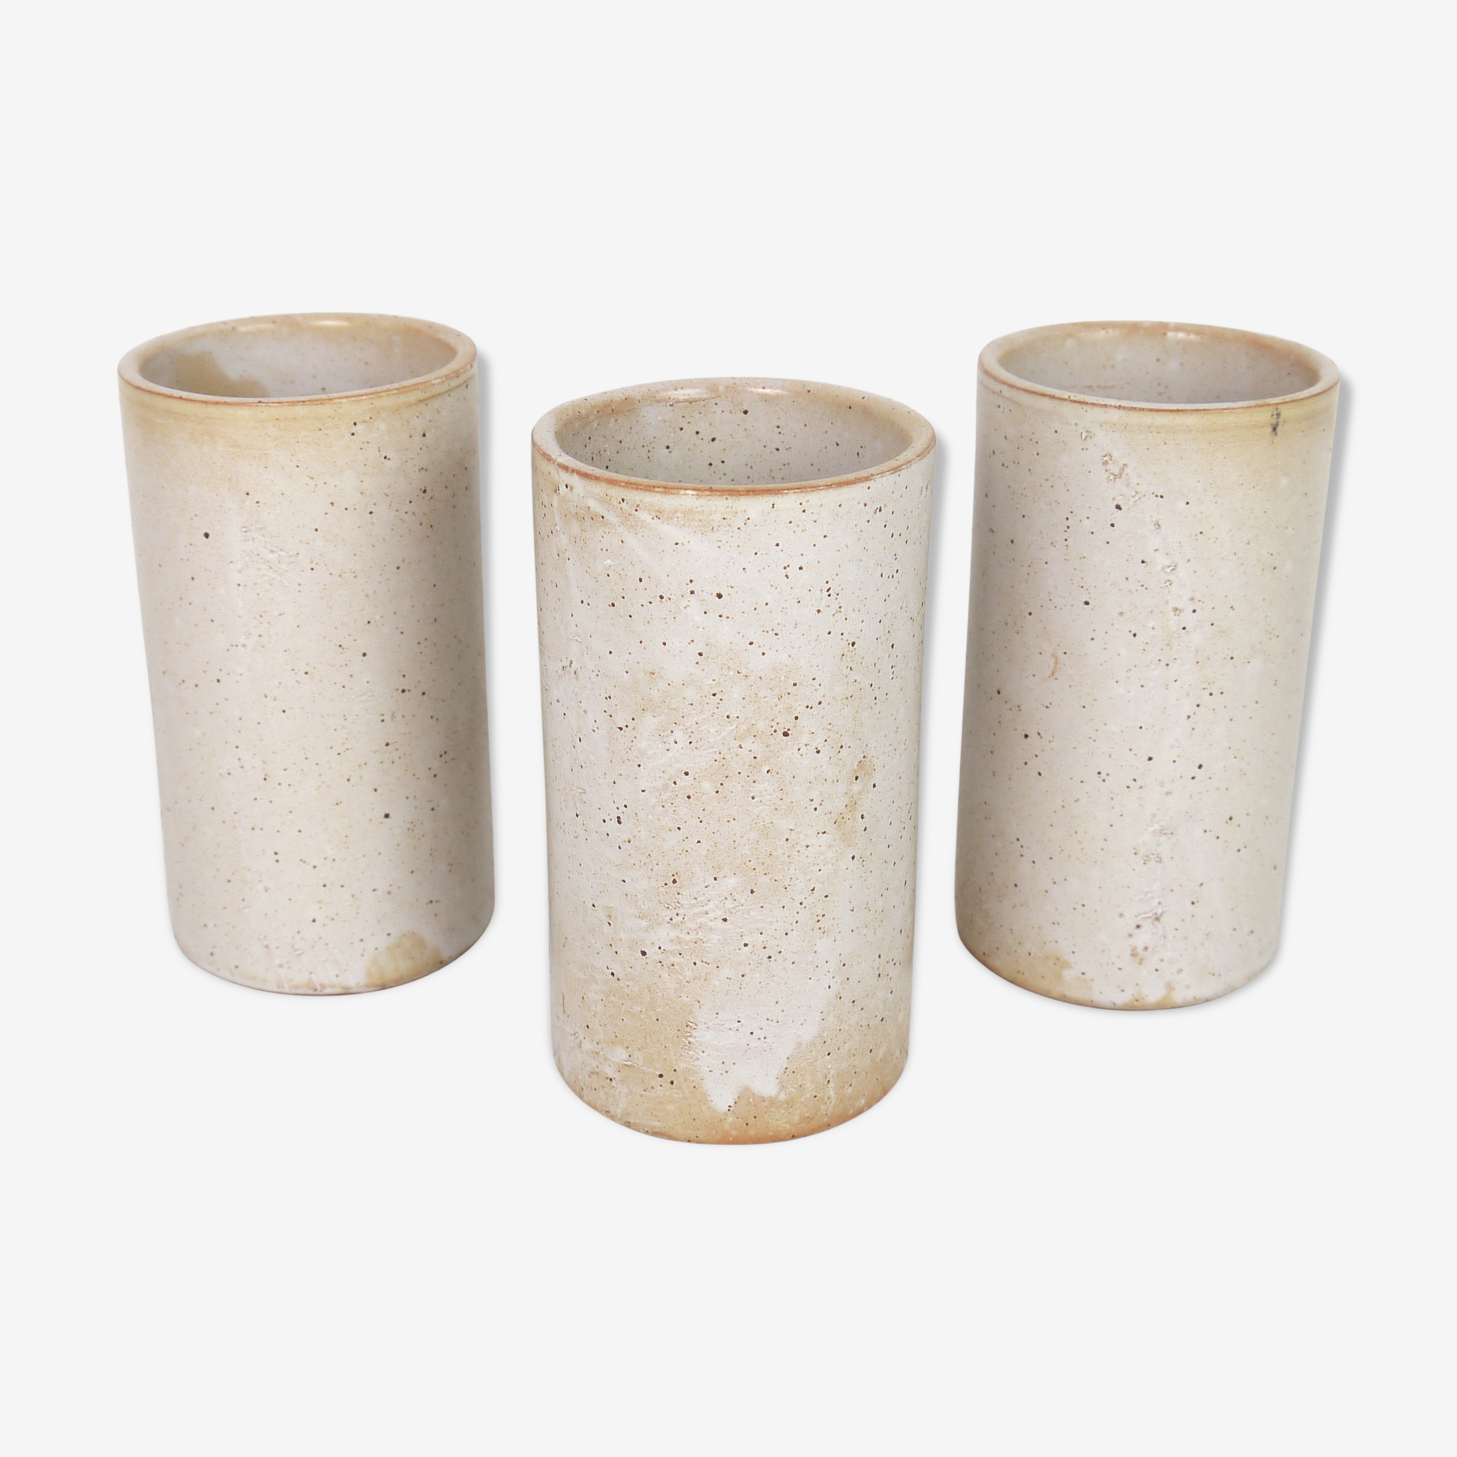 Three vases in stoneware